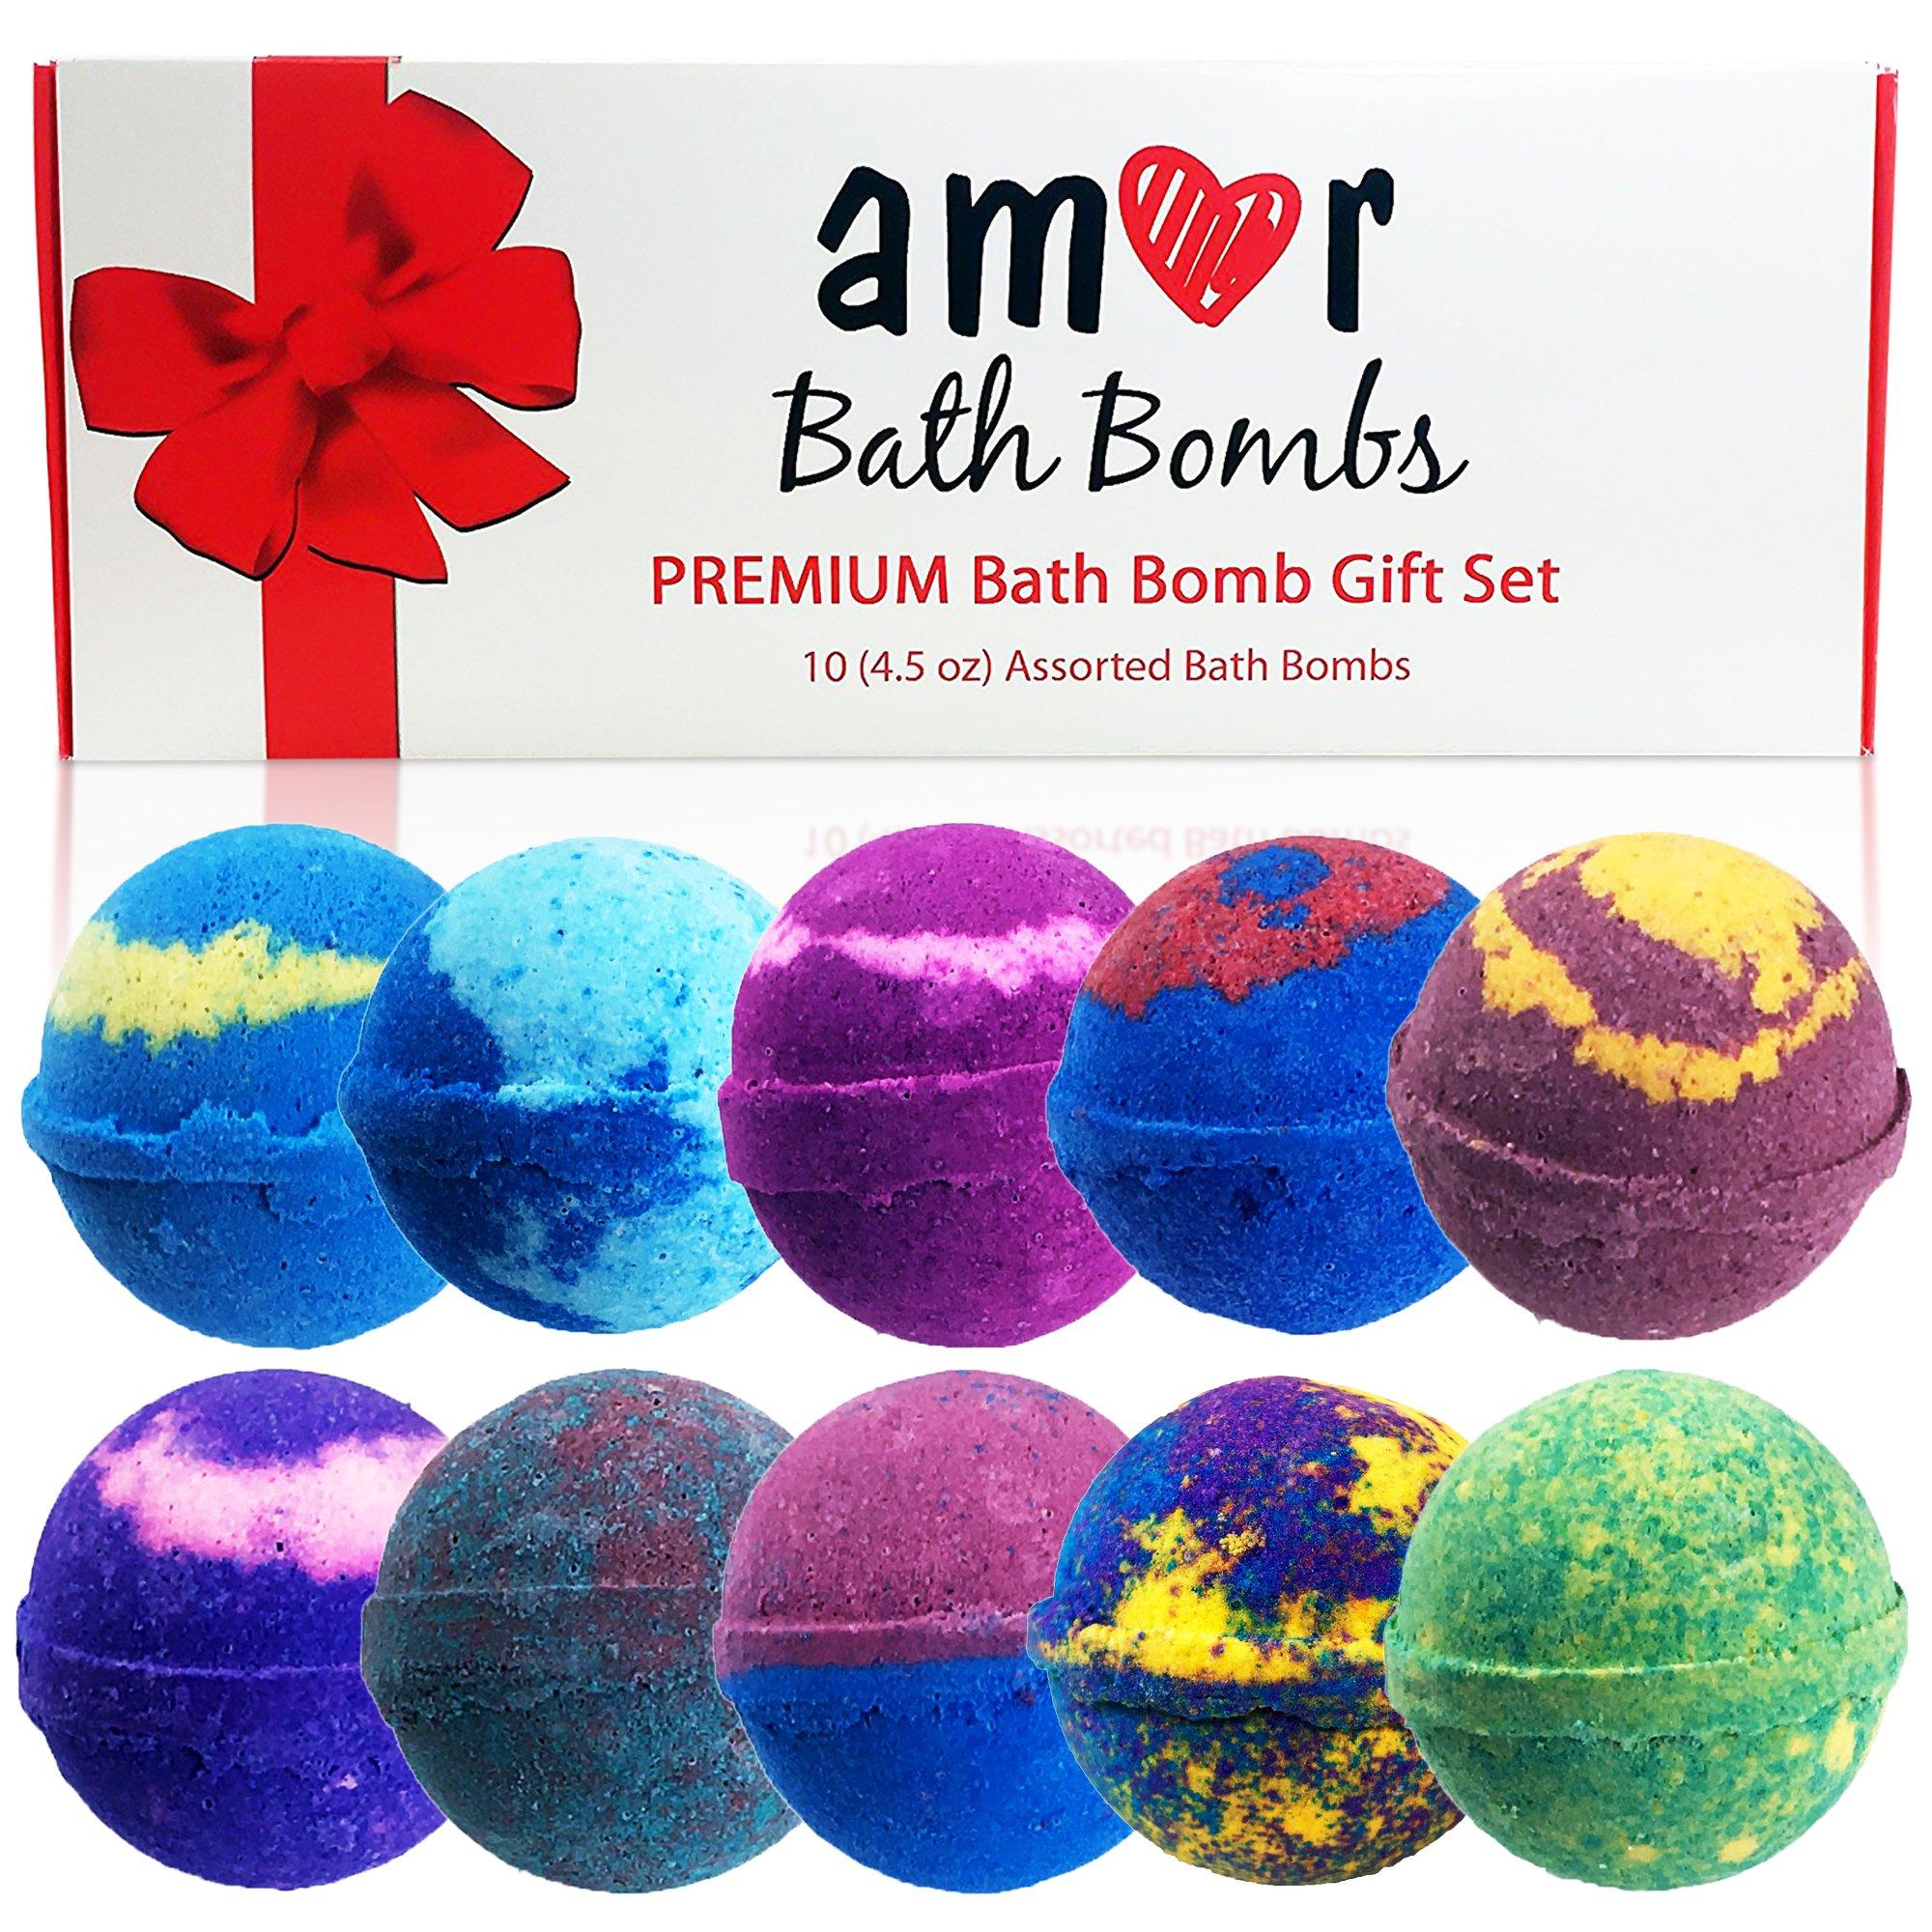 Bath bombs 10 wholesale bath bombs similar to - Bombe da bagno lush amazon ...